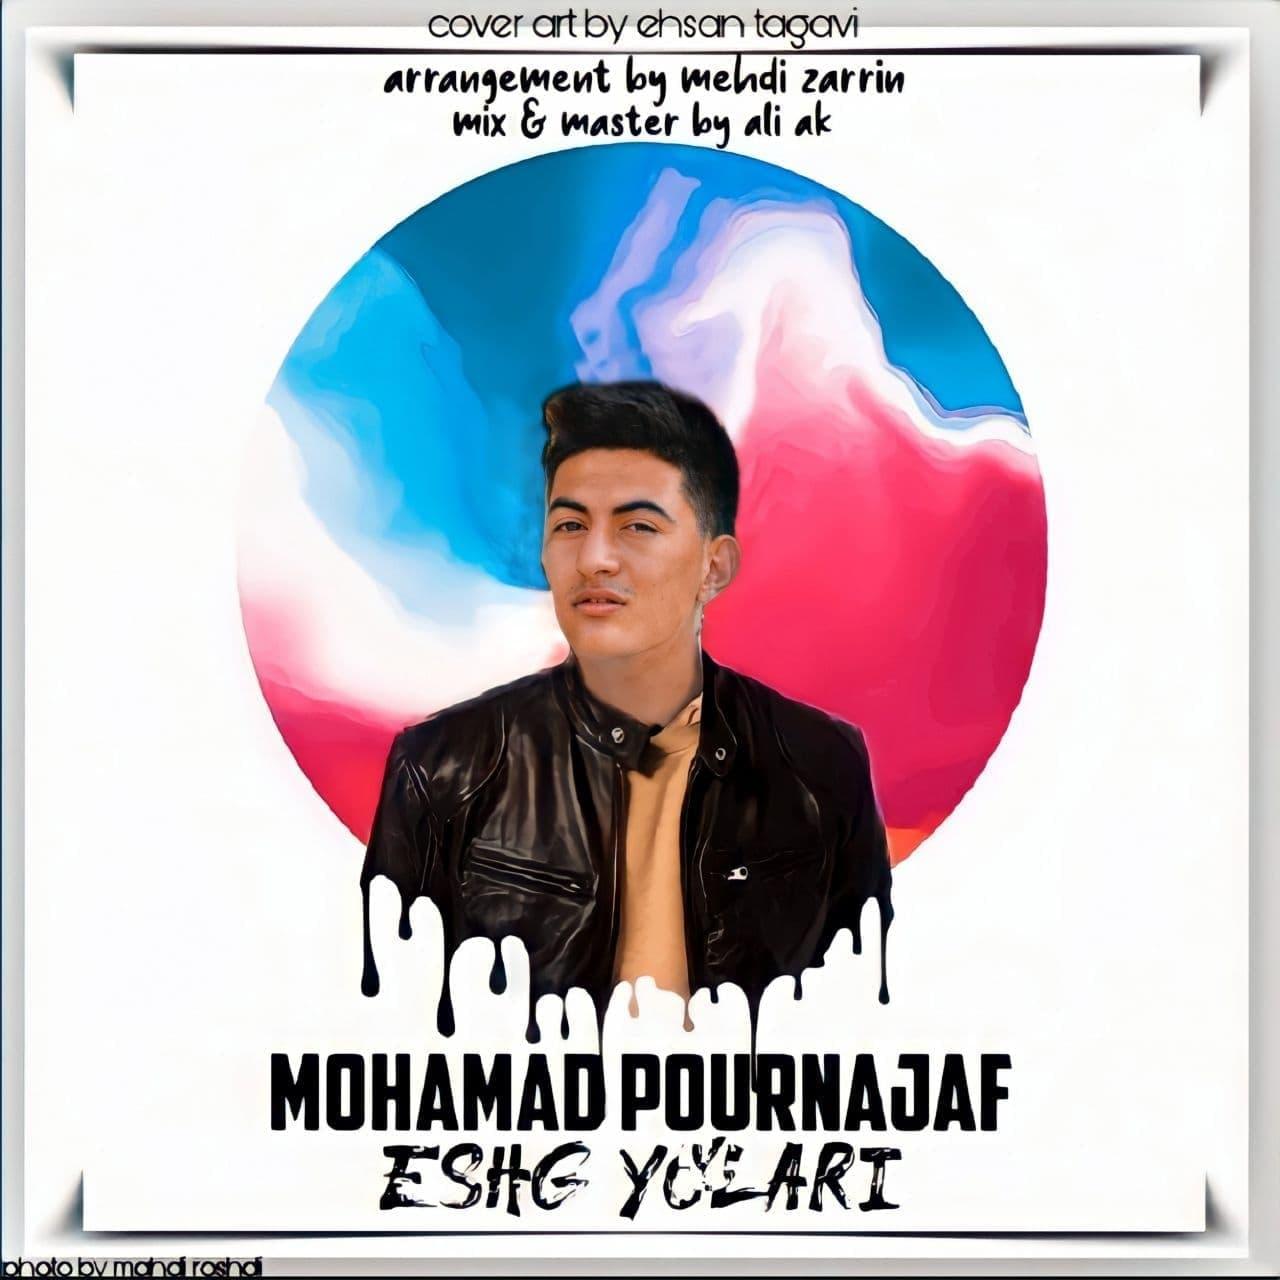 https://s16.picofile.com/file/8426319584/08Mohamad_Pournajaf_Eshg_Yollari.jpg